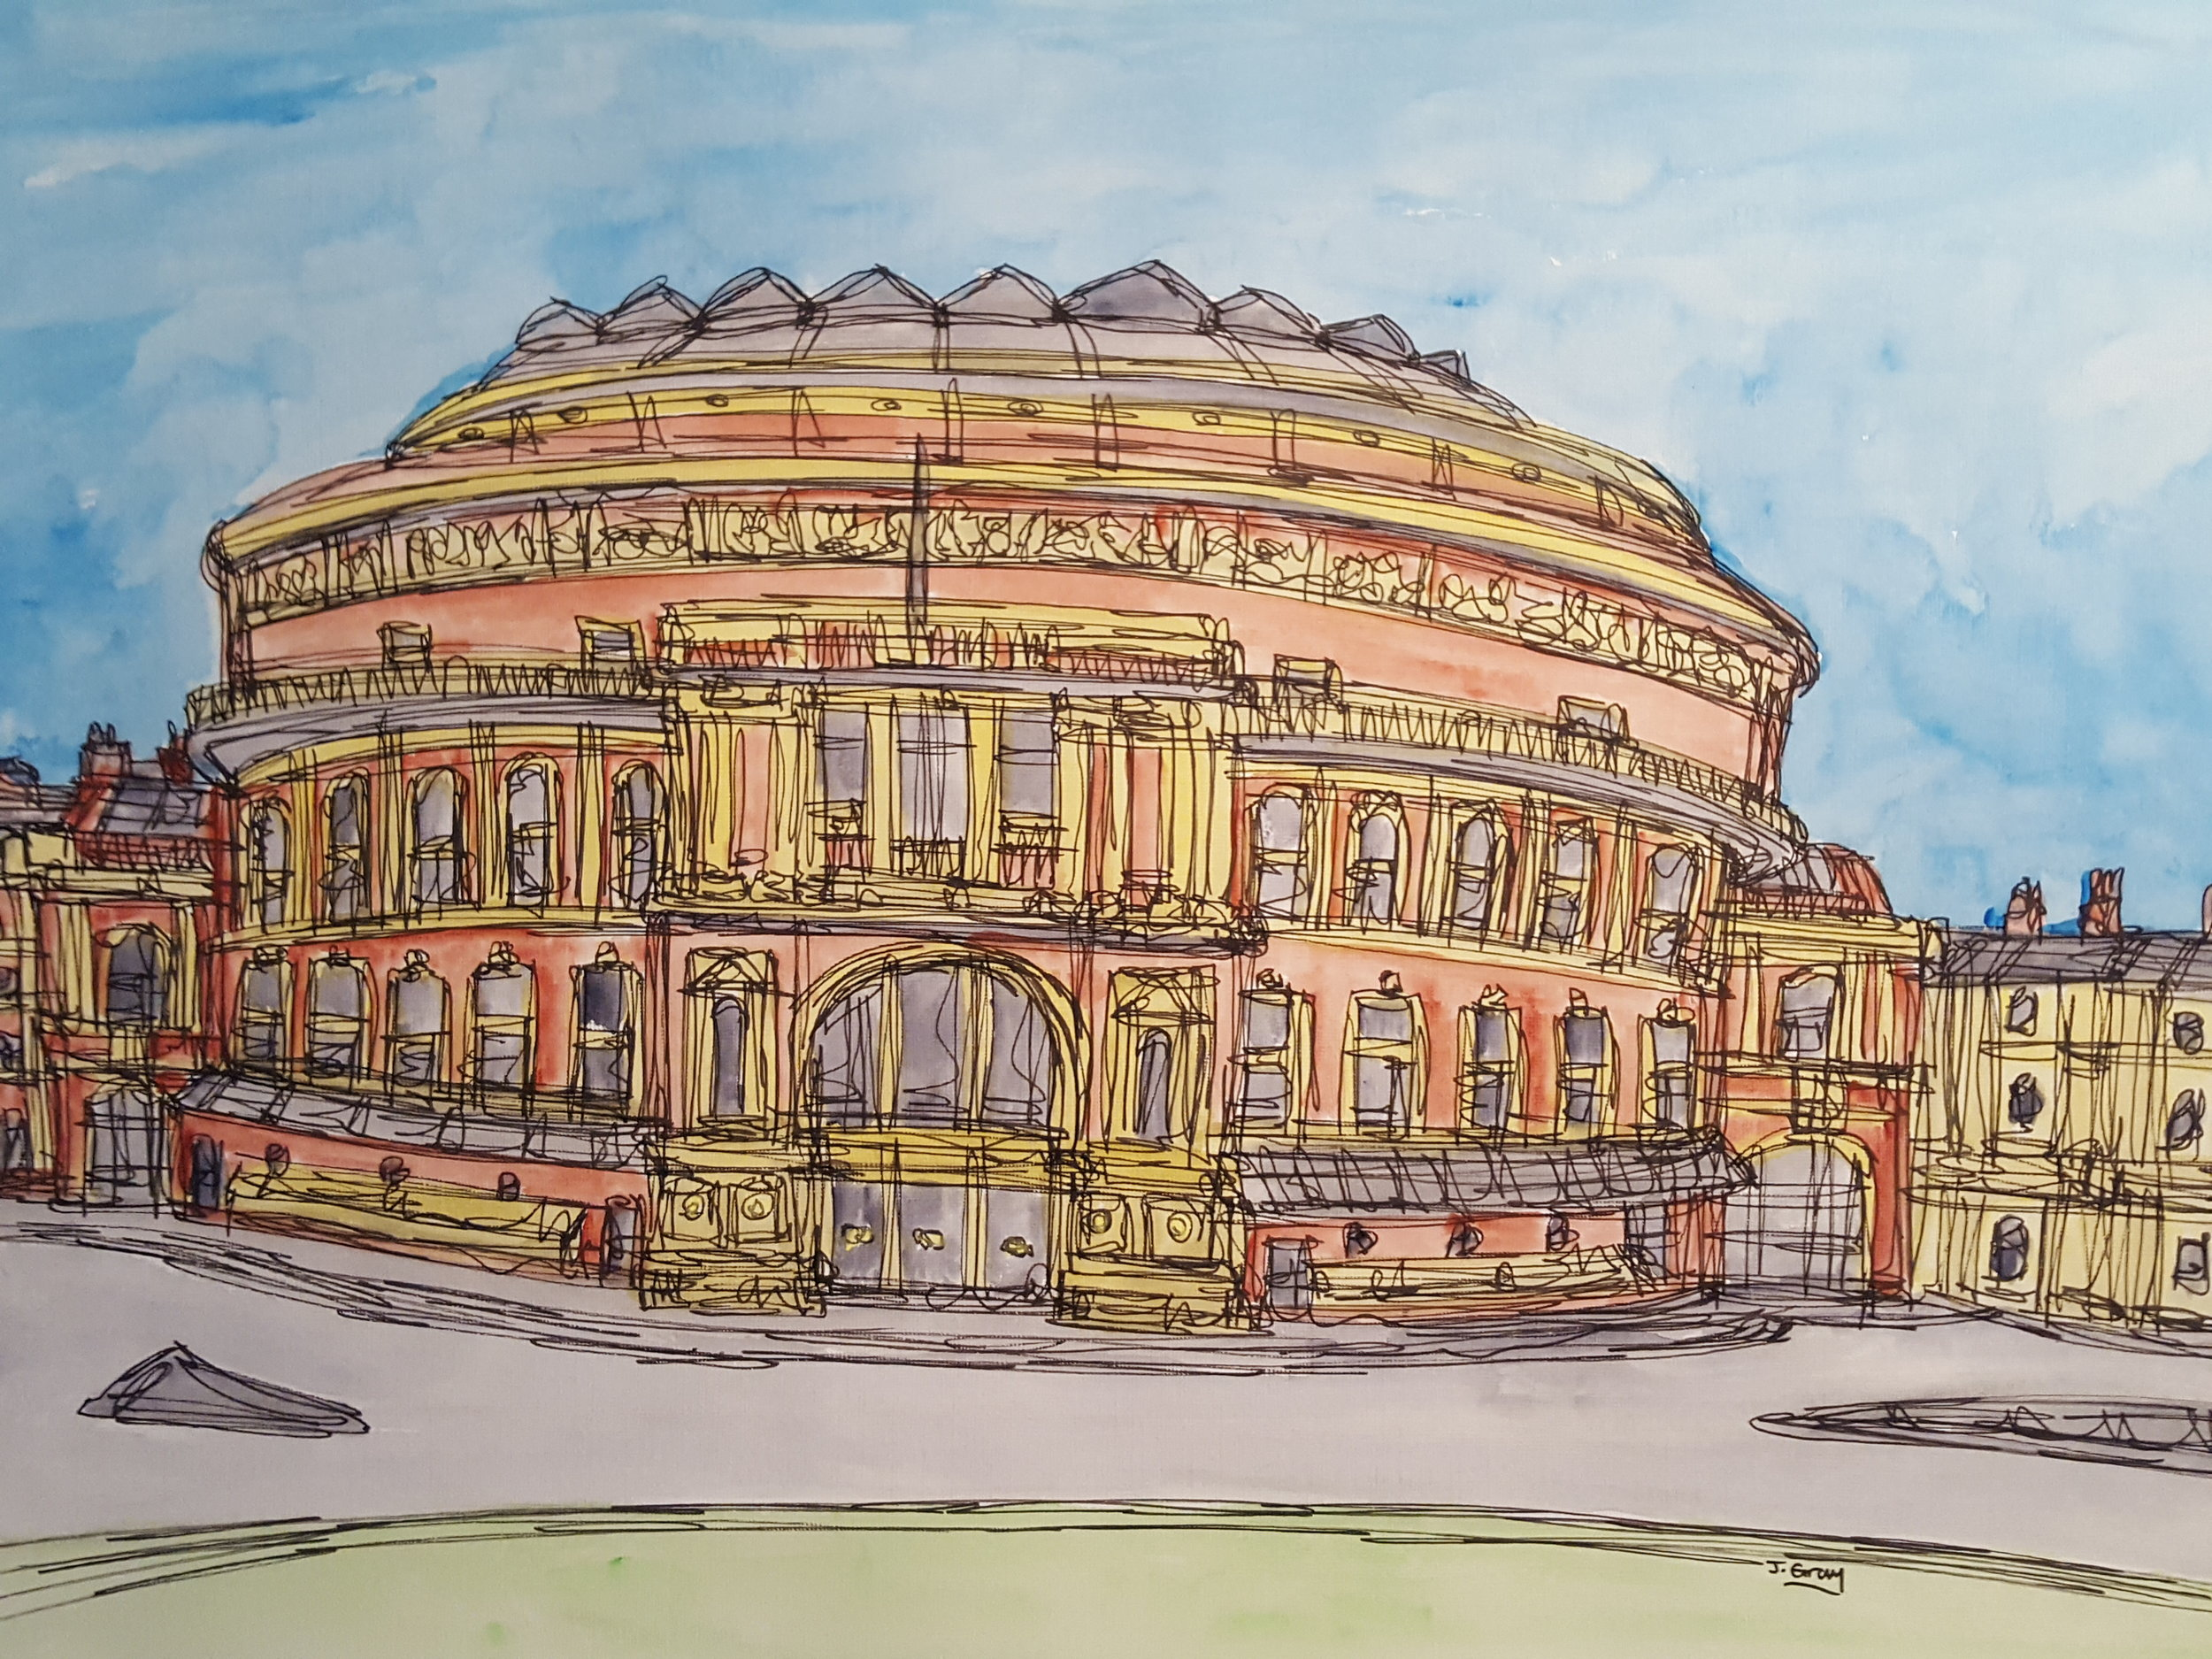 Royal Albert Hall, 2018 | Watercolour & Fine liner on paper | 43 x 53 cm | £295